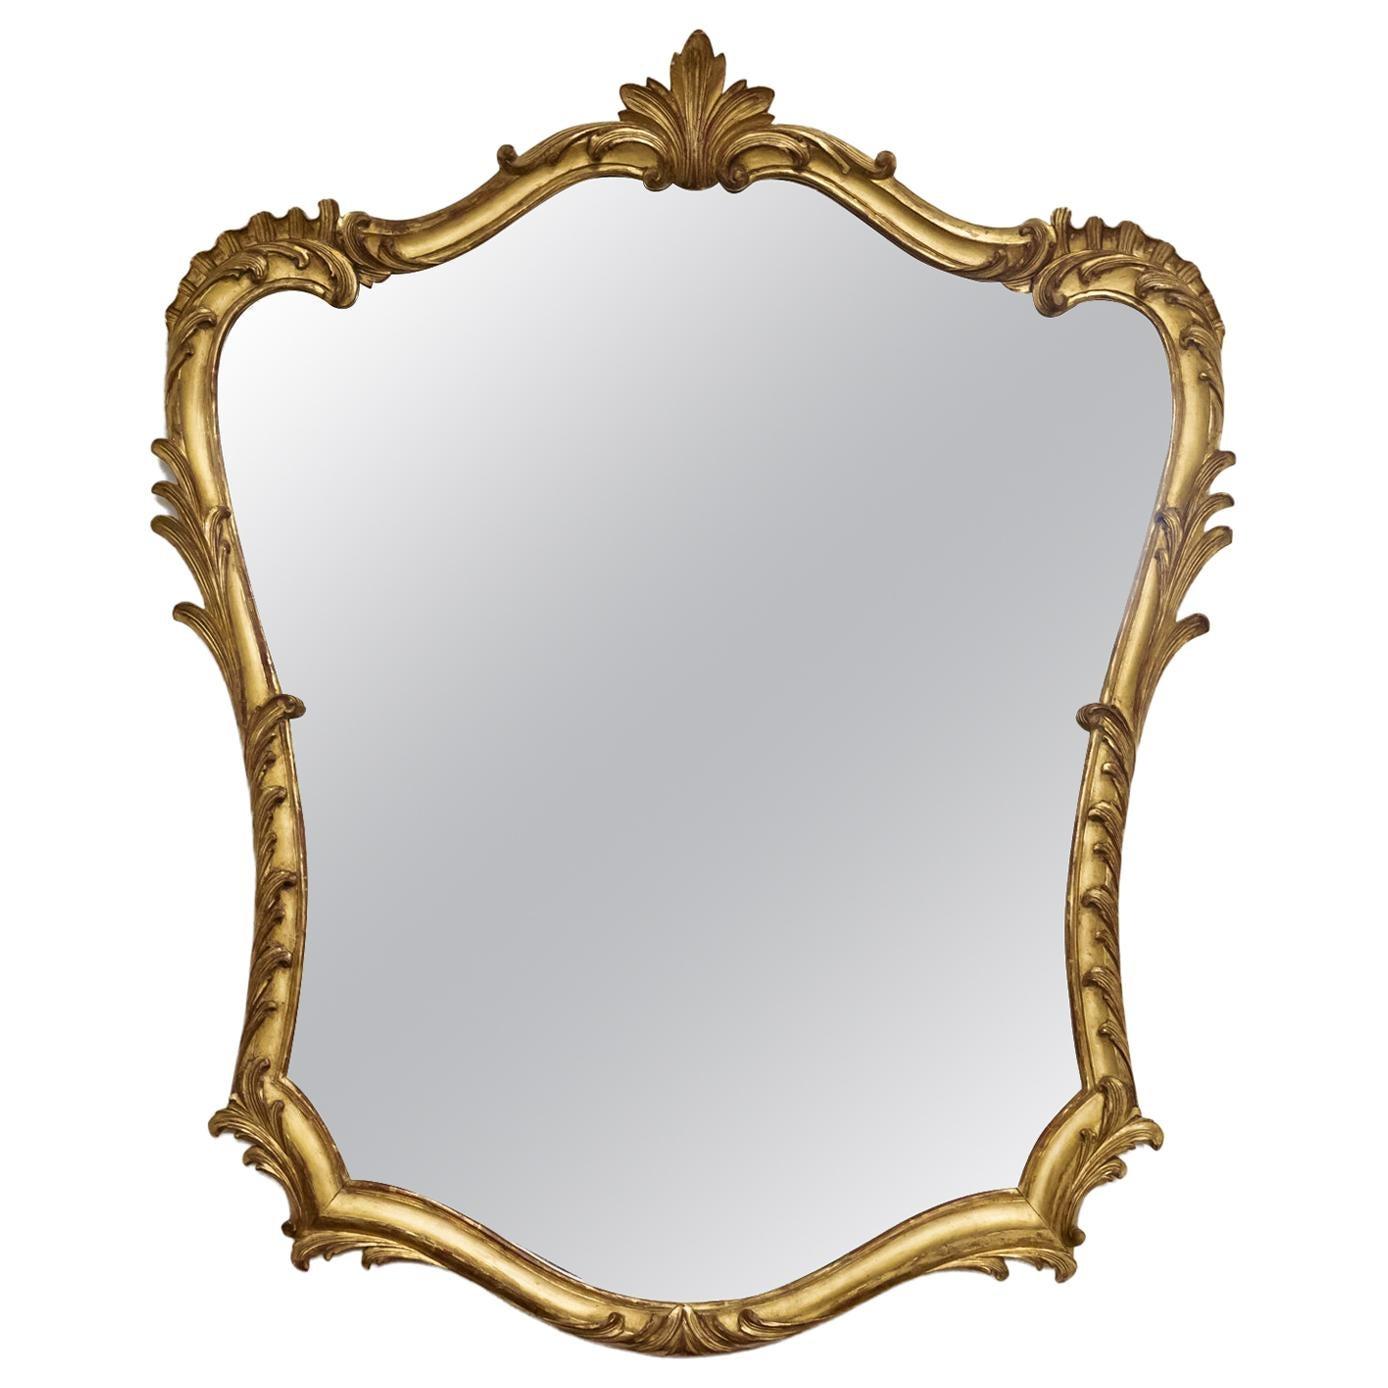 19th Century French Rococo Louis XV Style Giltwood Mirror